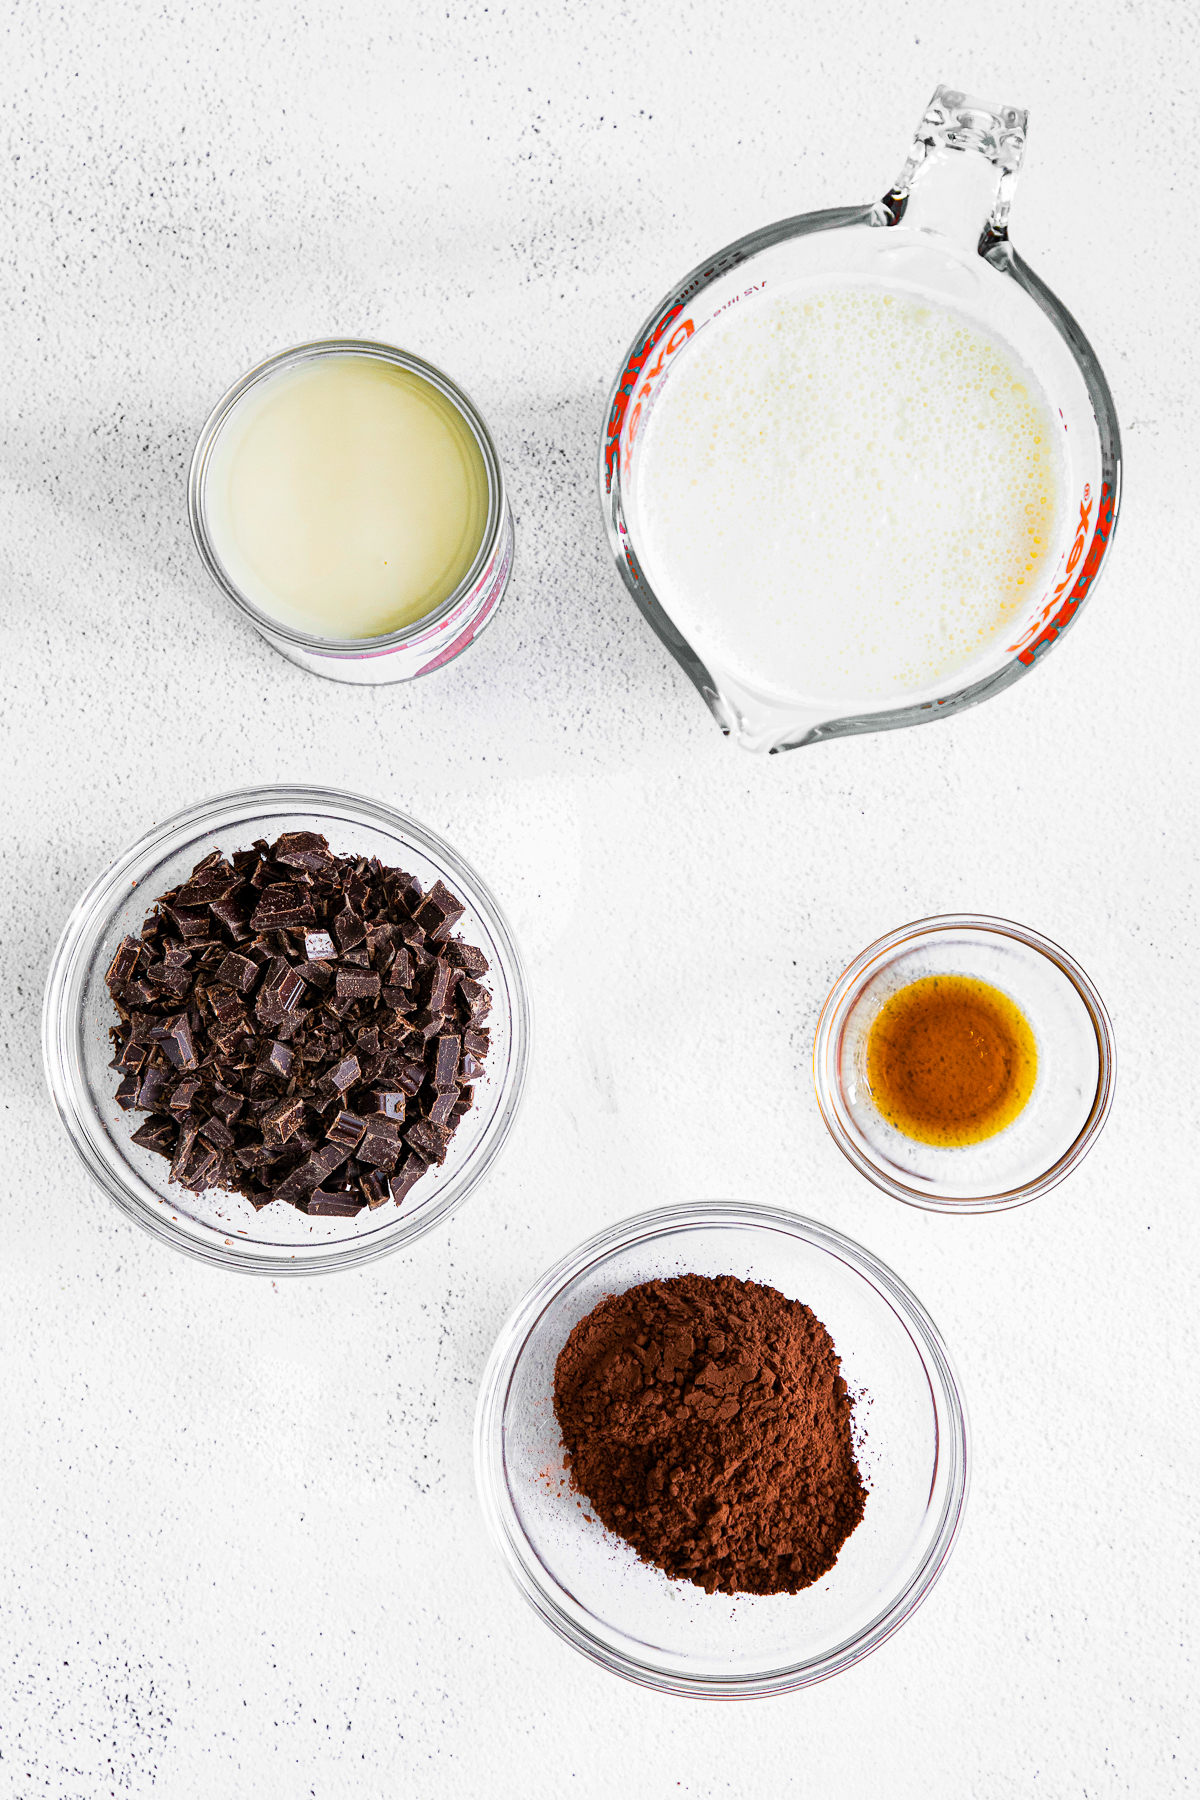 Ingredients needed to make No Churn Chocolate Ice Cream Recipe